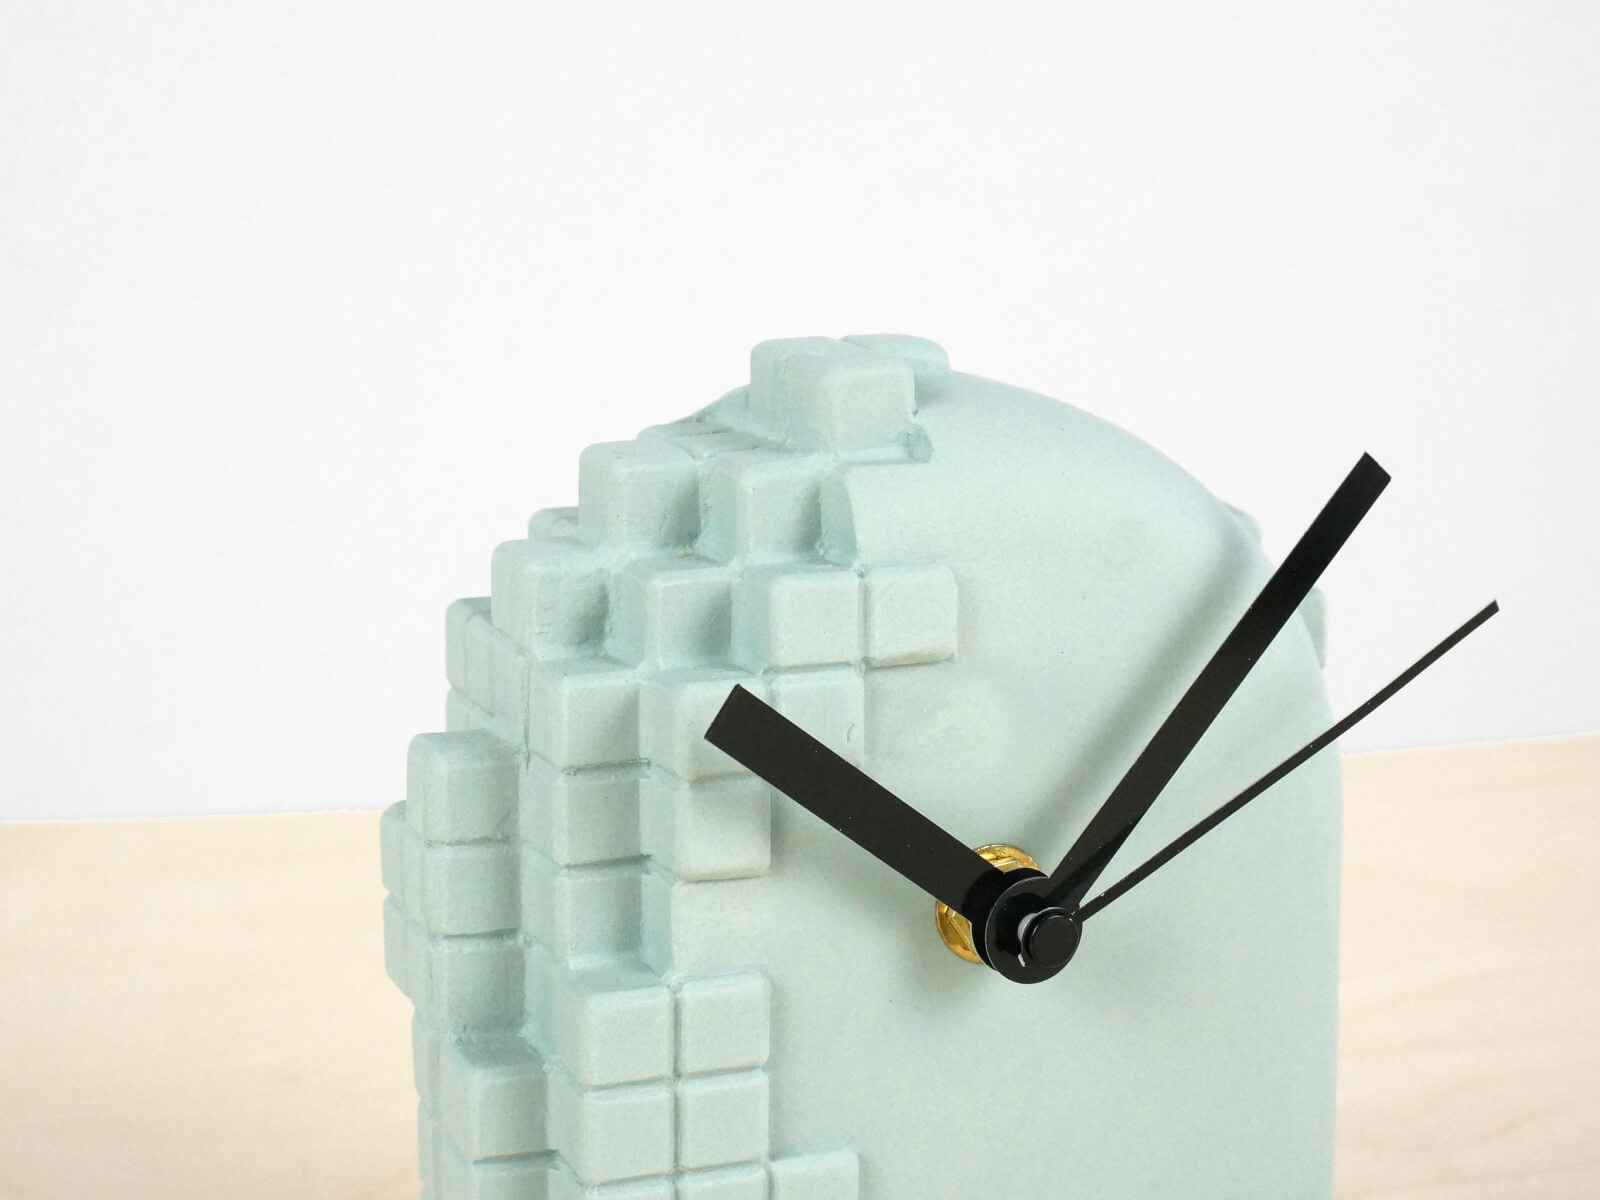 desk decor and blu home one robot furniture gadgets homewares kappa gifts nood clock